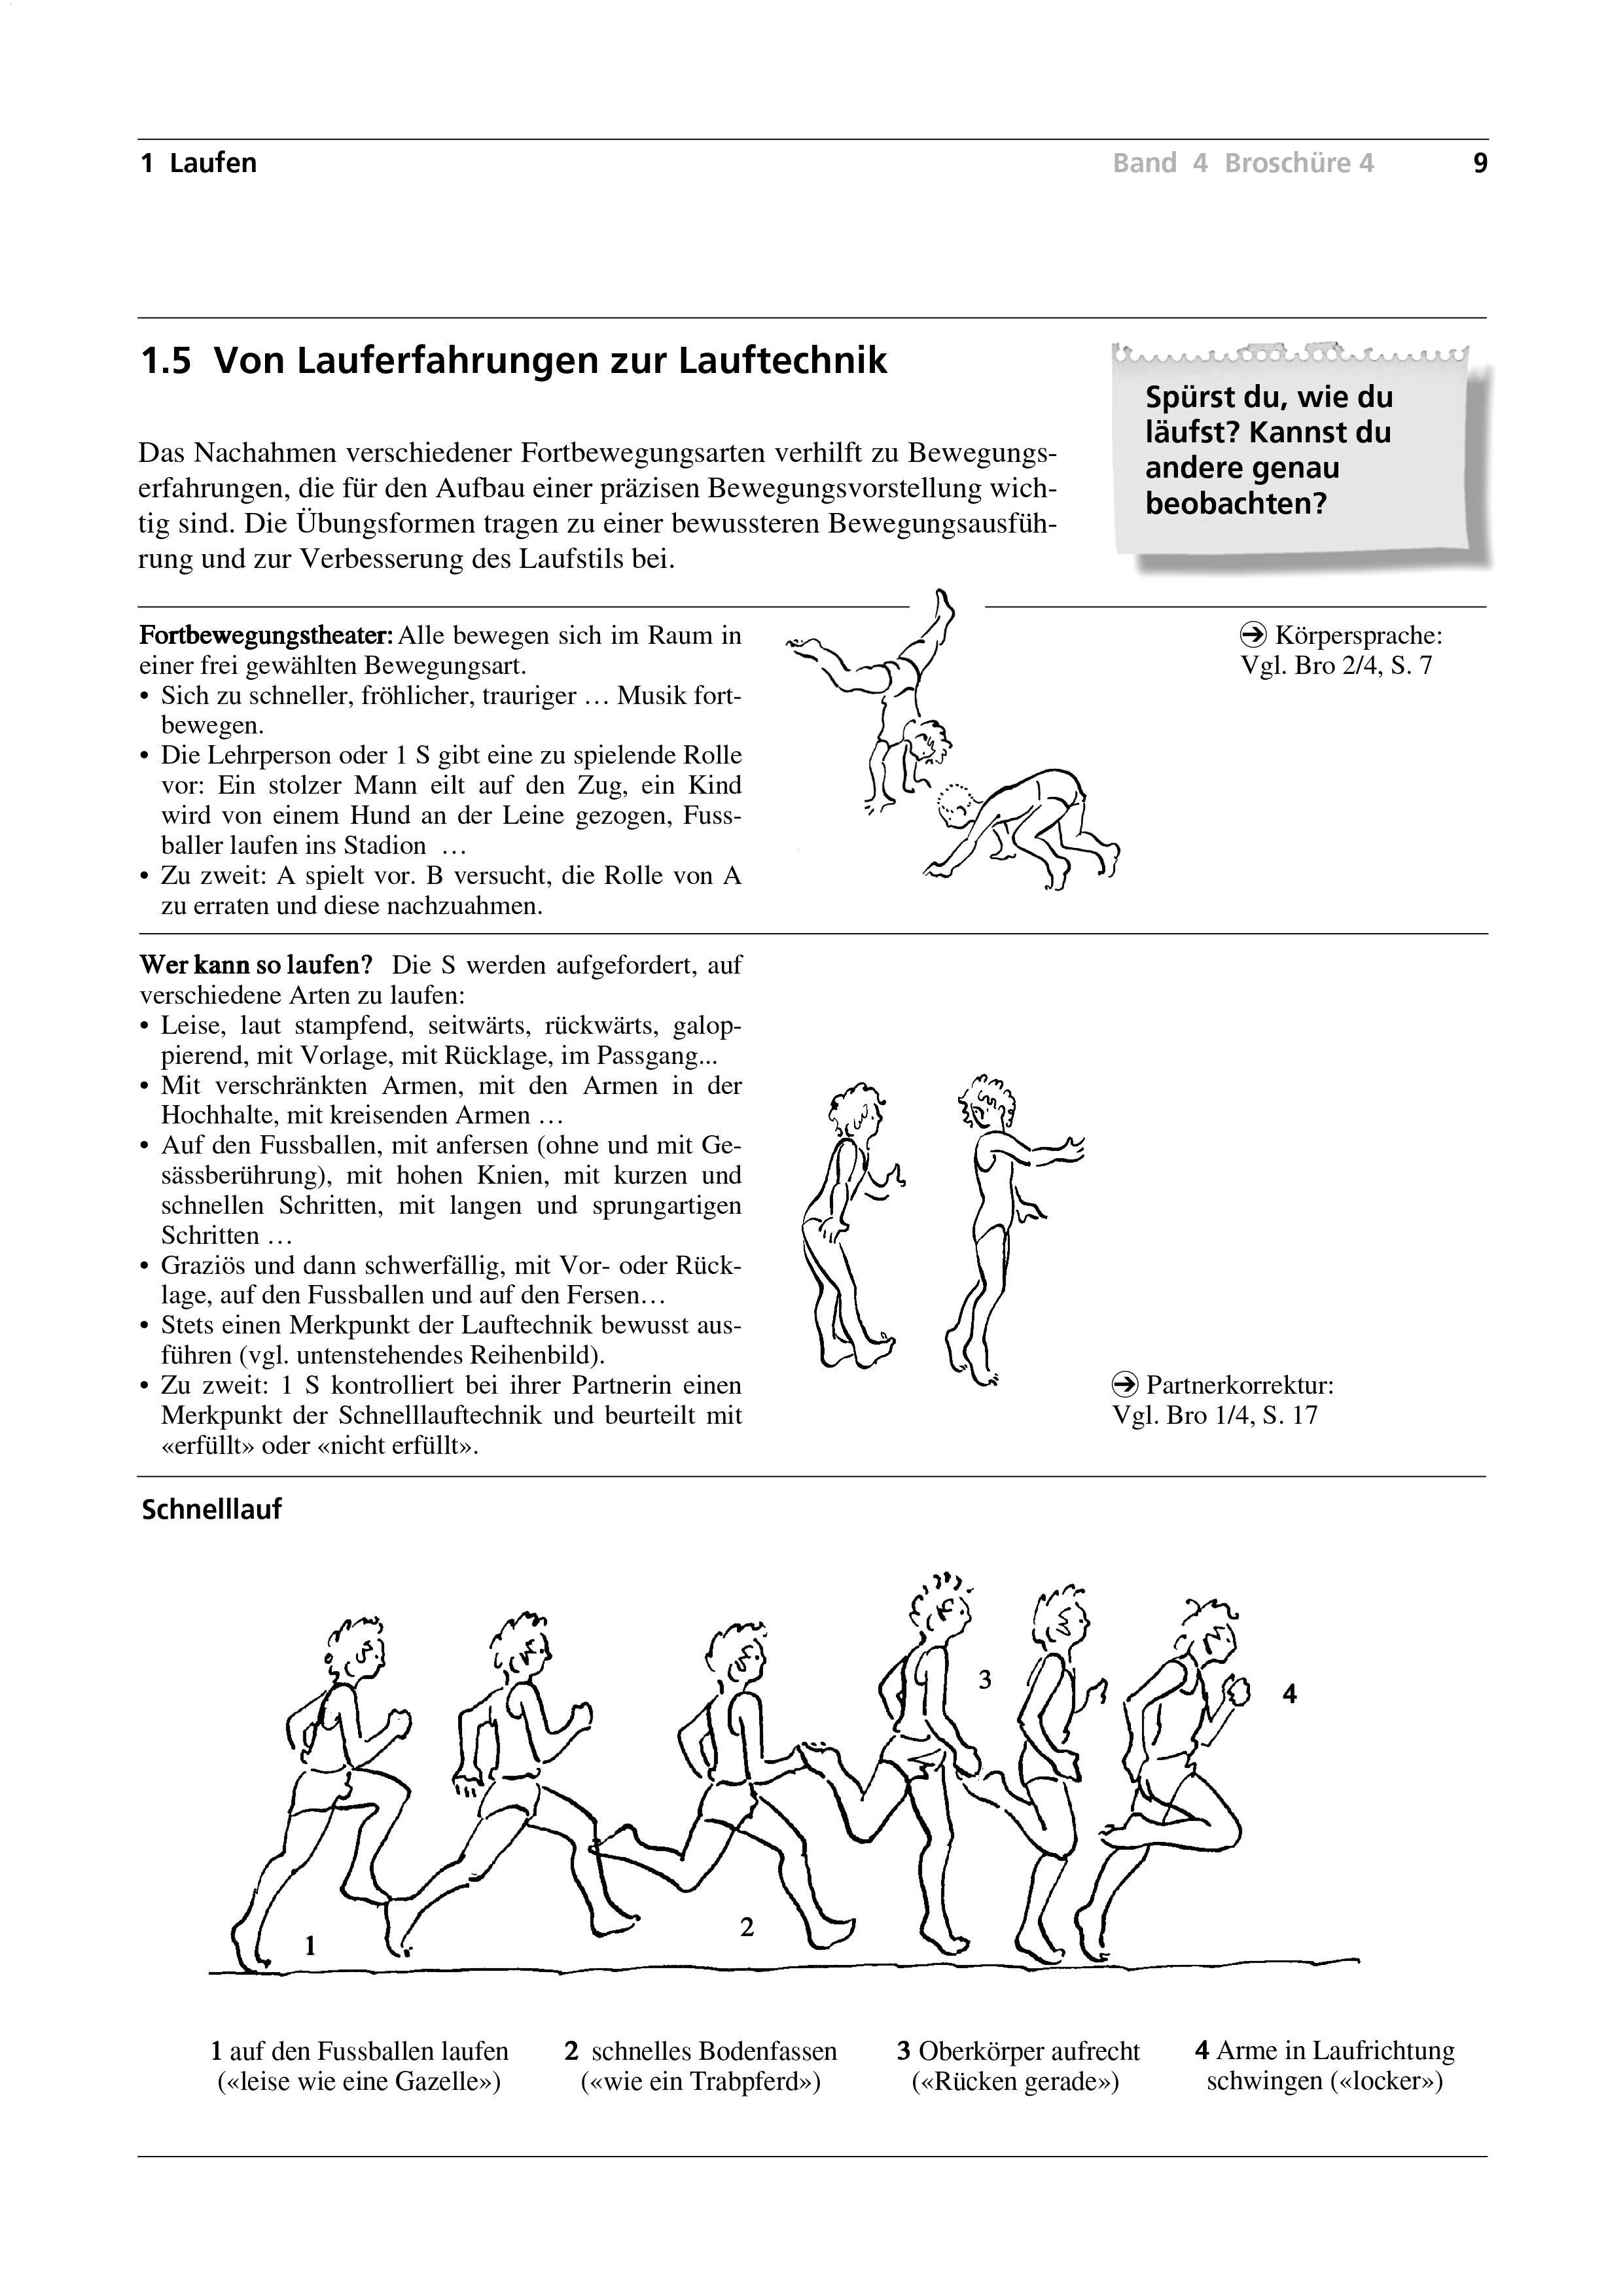 Preview image for LOM object Von Lauferfahrungen zur Lauftechnik